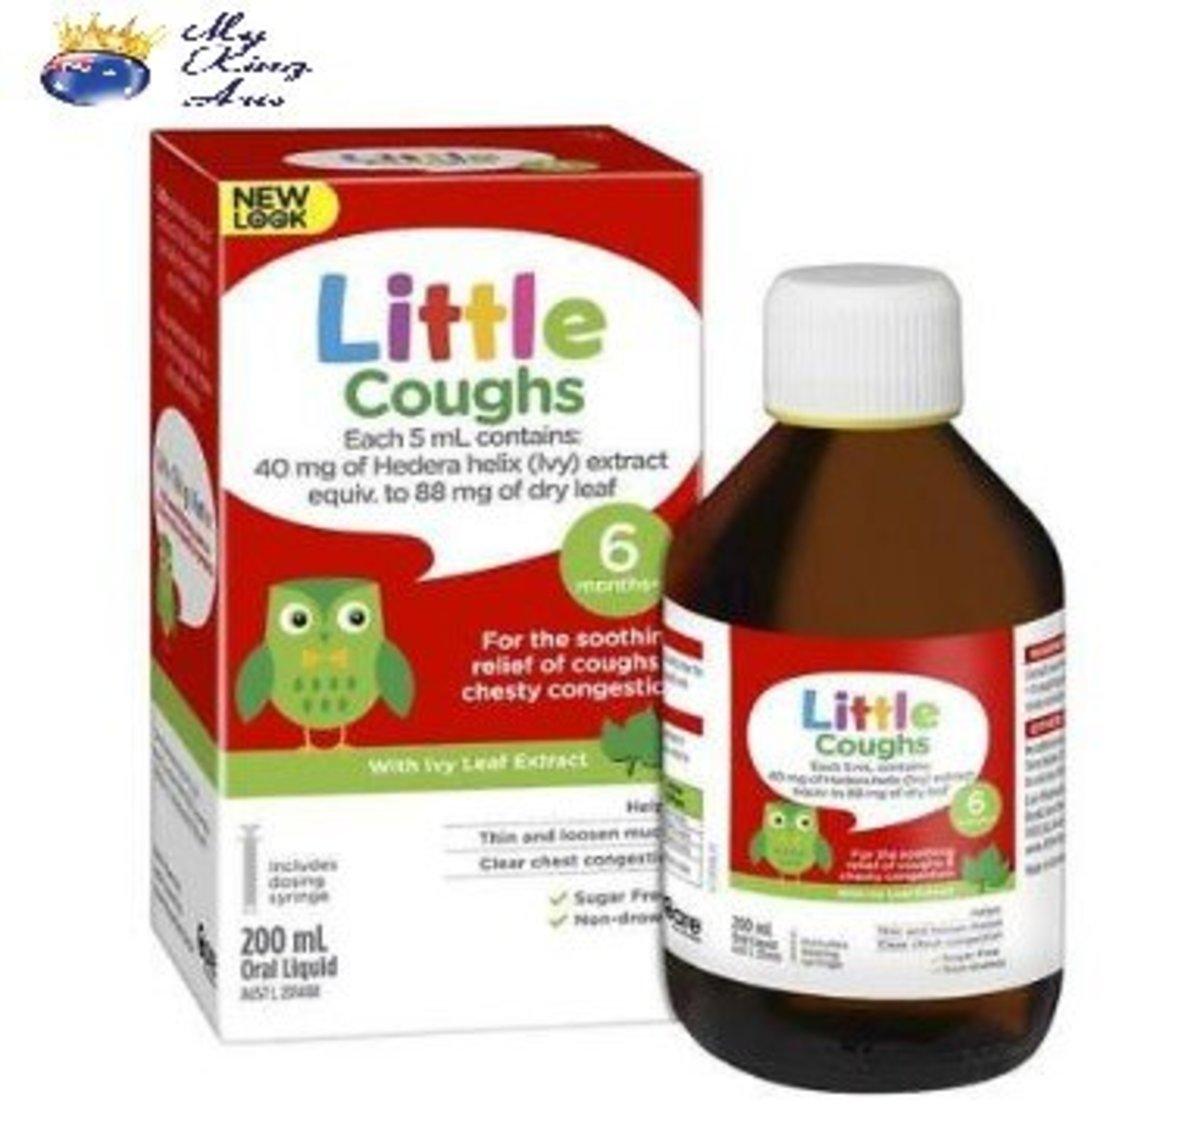 Little Coughs - 200ml (Parallel Import)